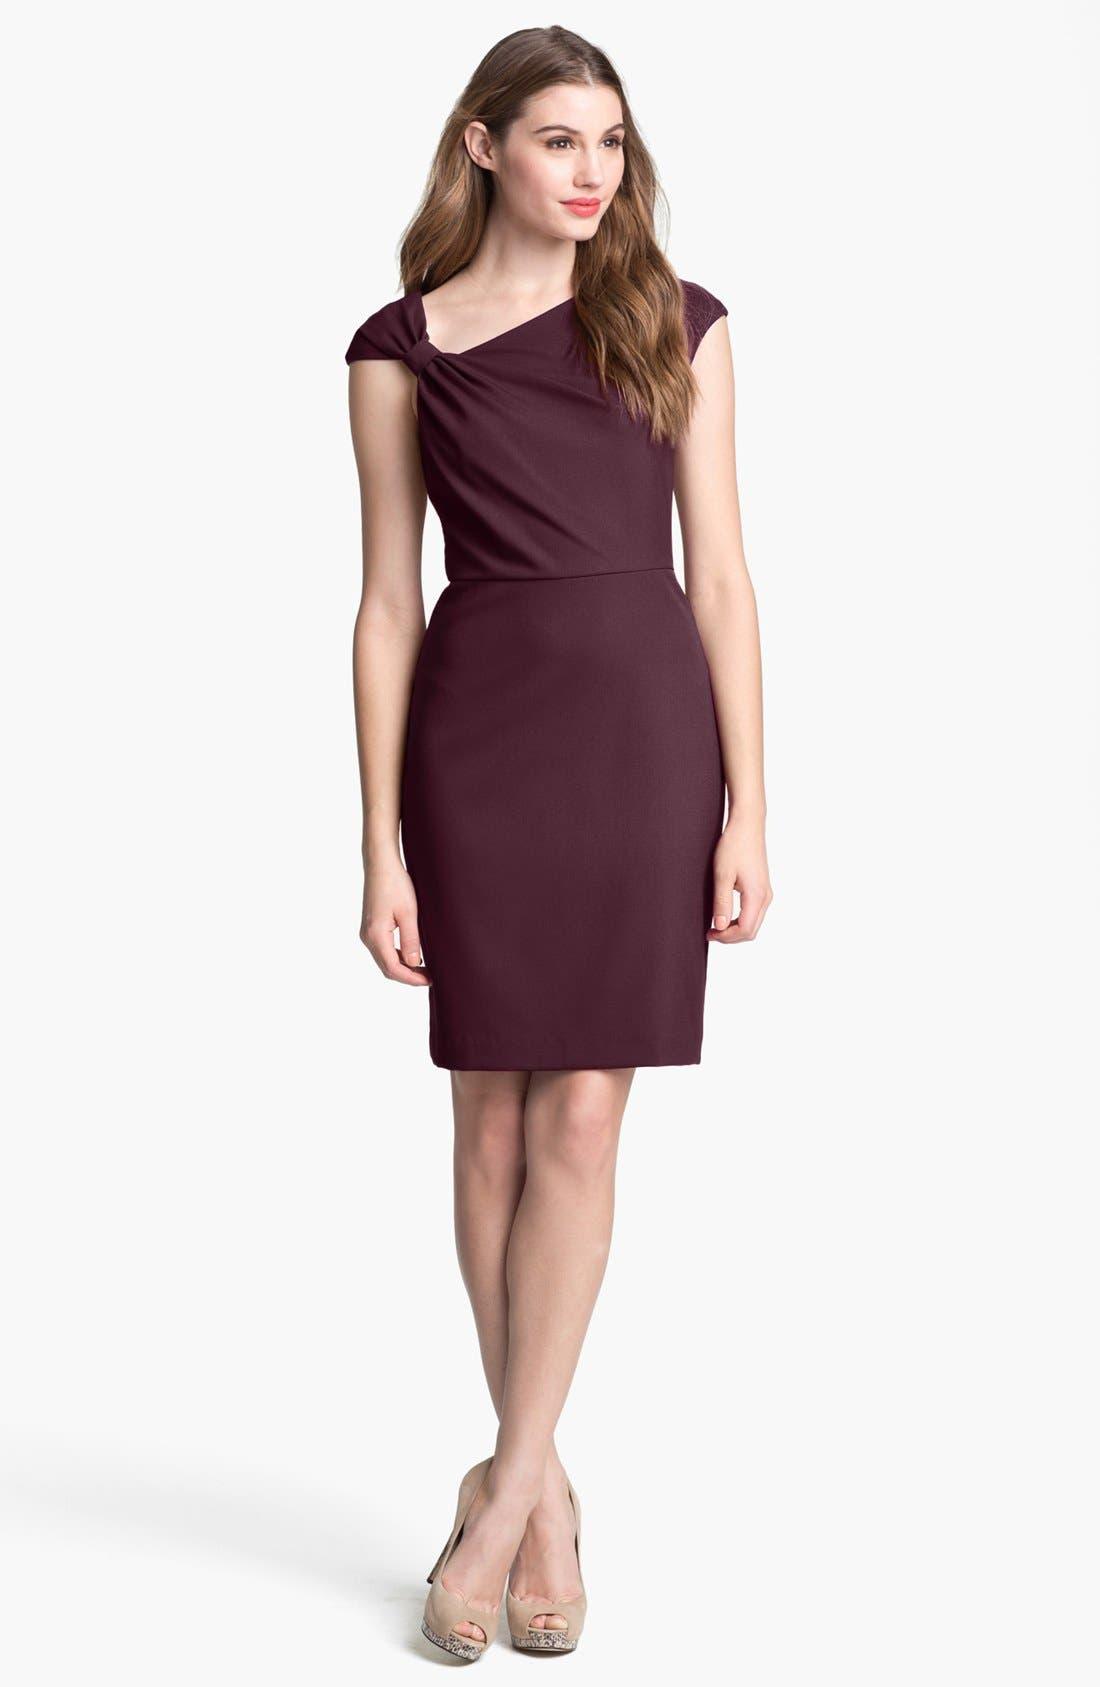 Alternate Image 1 Selected - Ivy & Blu Cap Sleeve Sheath Dress (Petite)